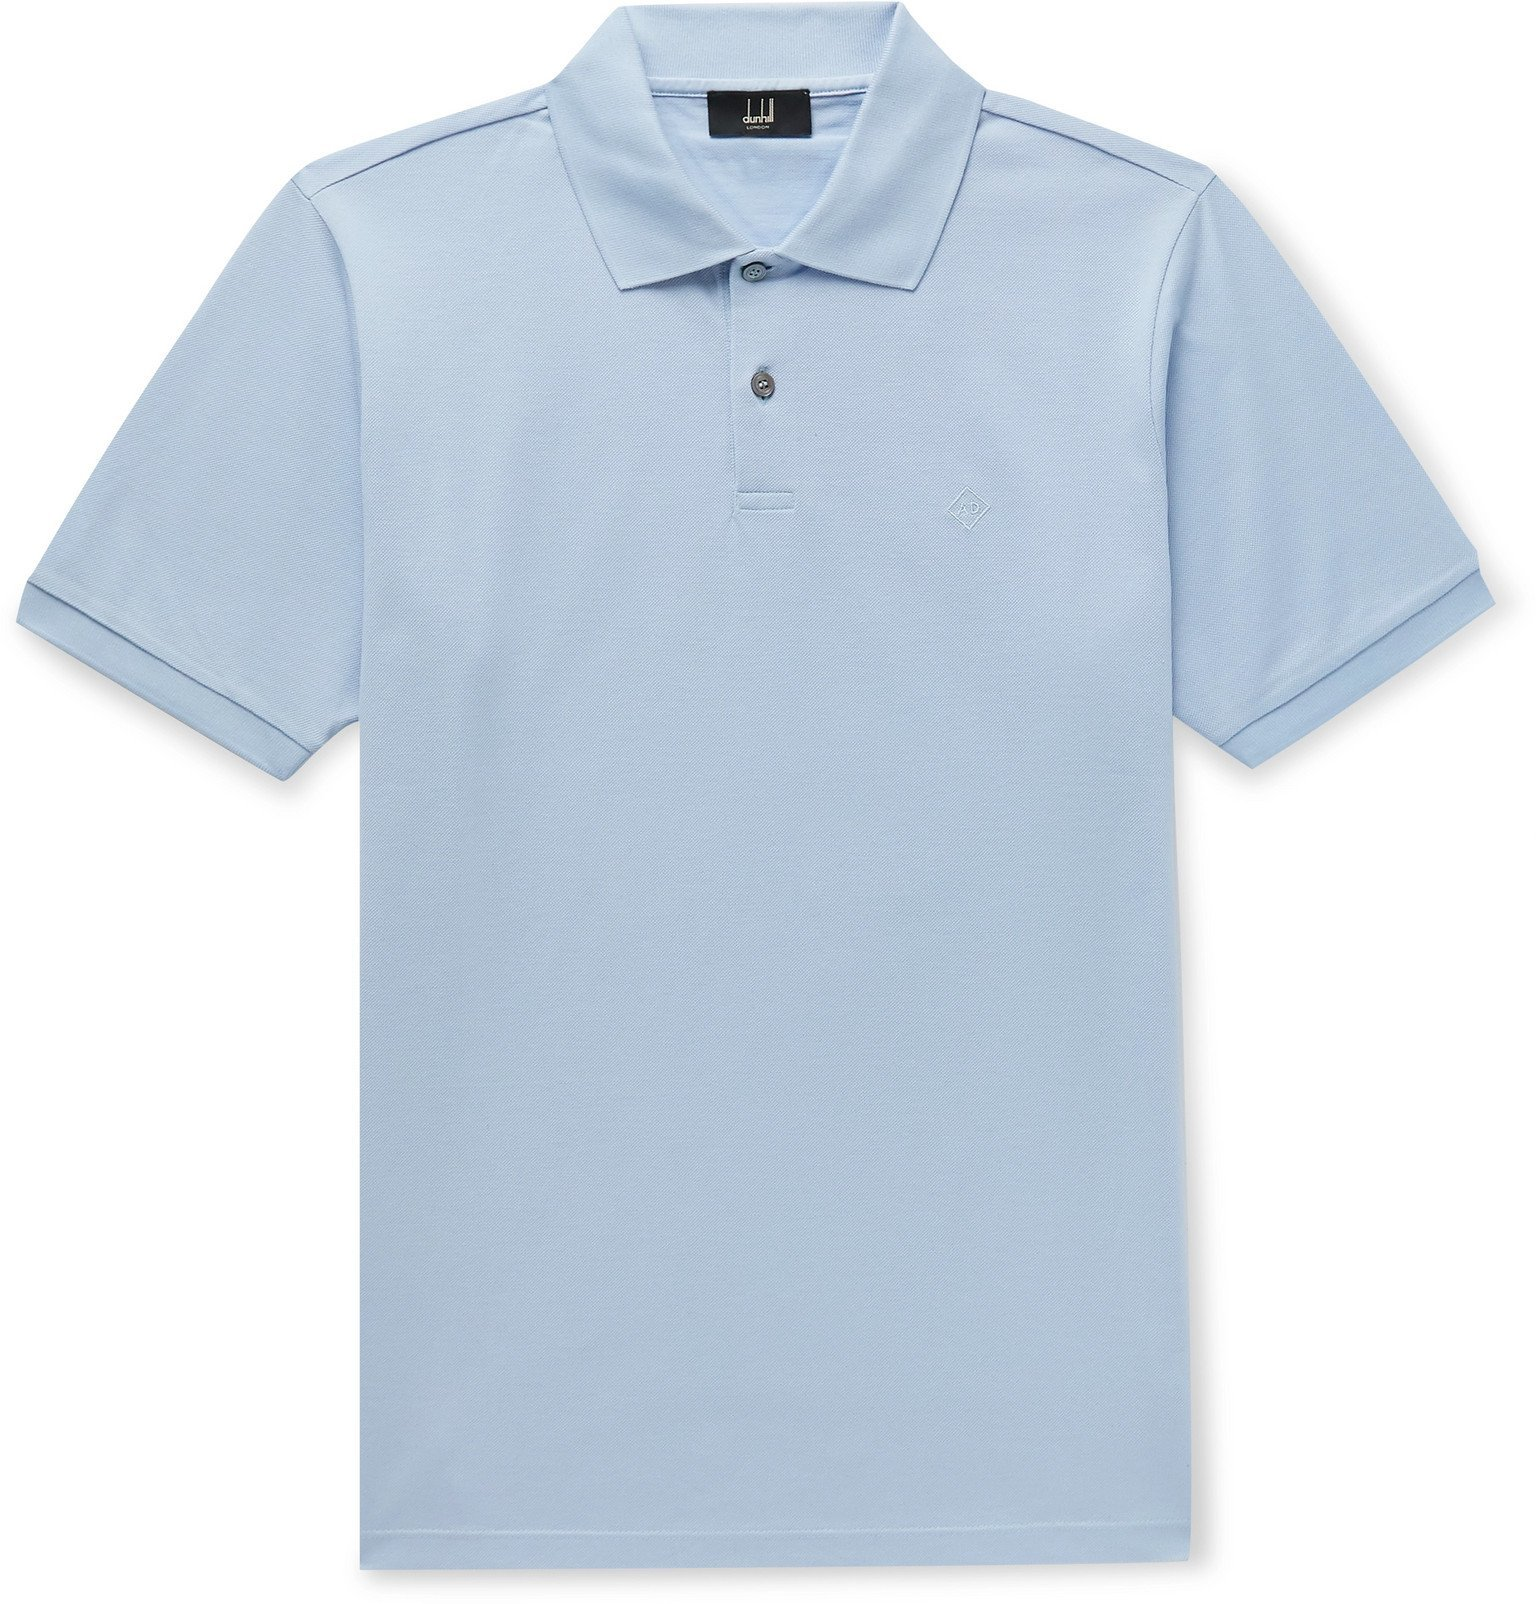 Dunhill - Slim-Fit Logo-Embroidered Cotton-Piqué Polo Shirt - Blue